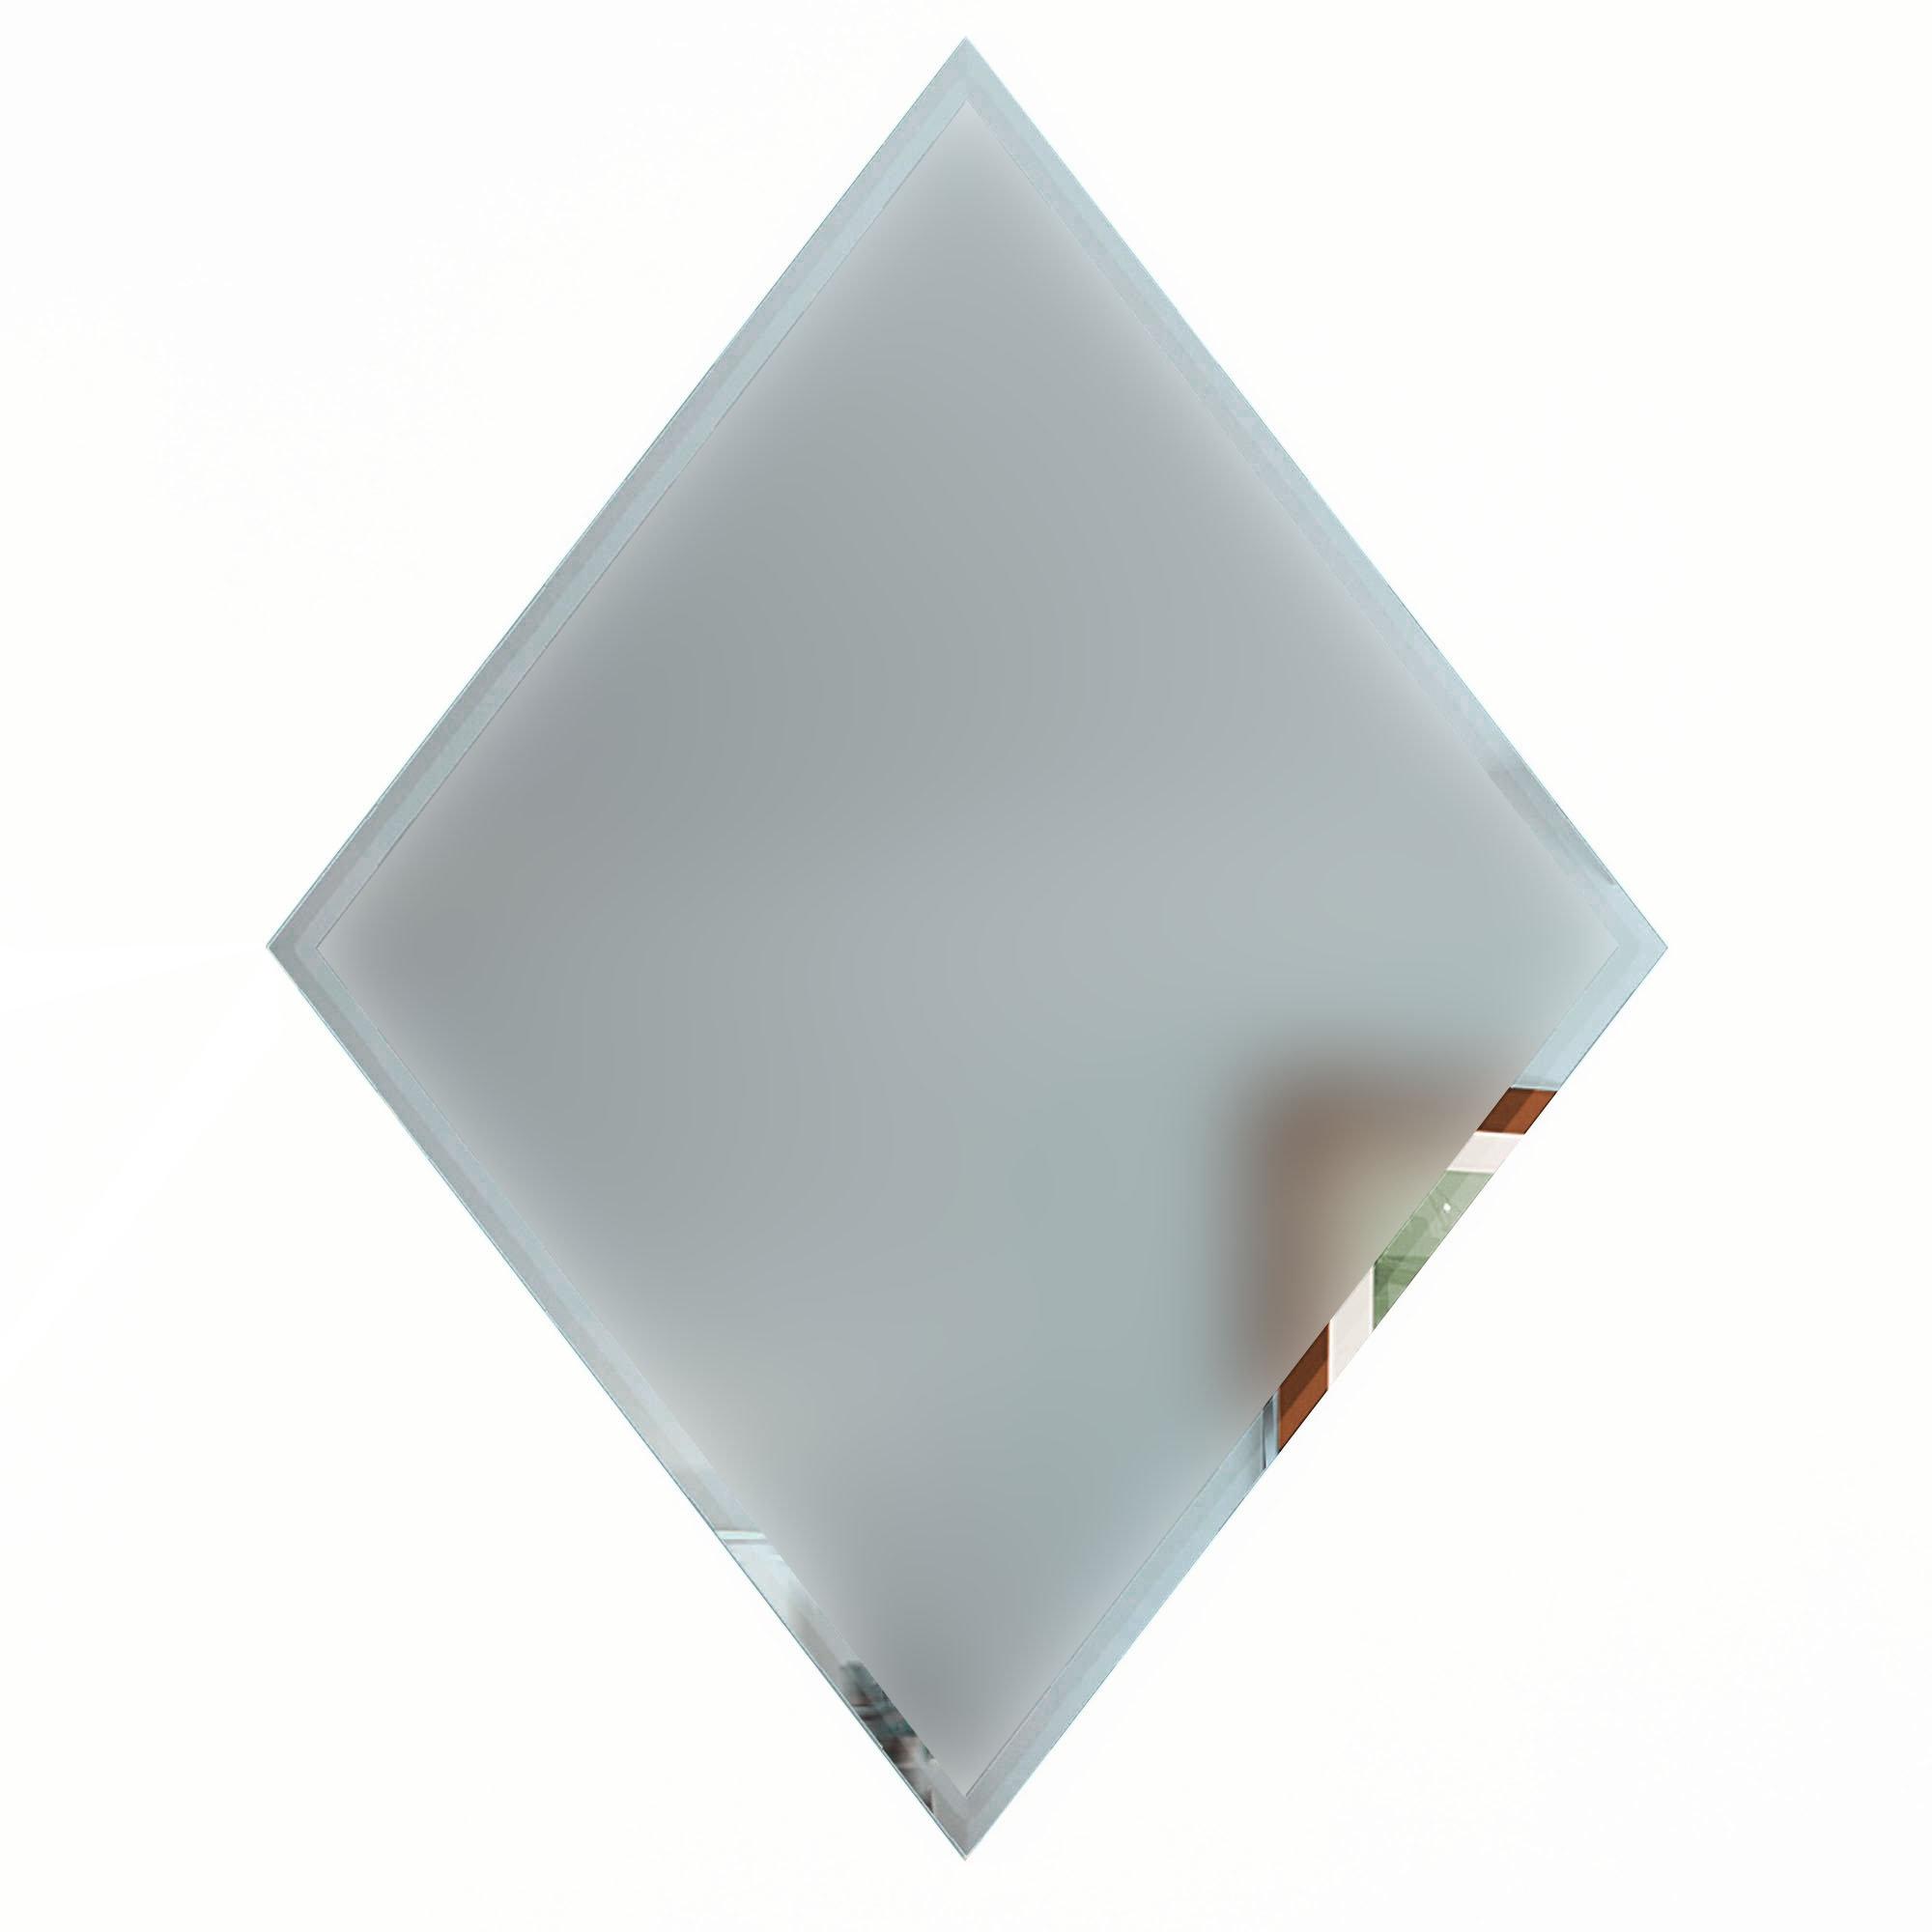 6 X 6 Beveled Mirror Tiles Tile Design Ideas